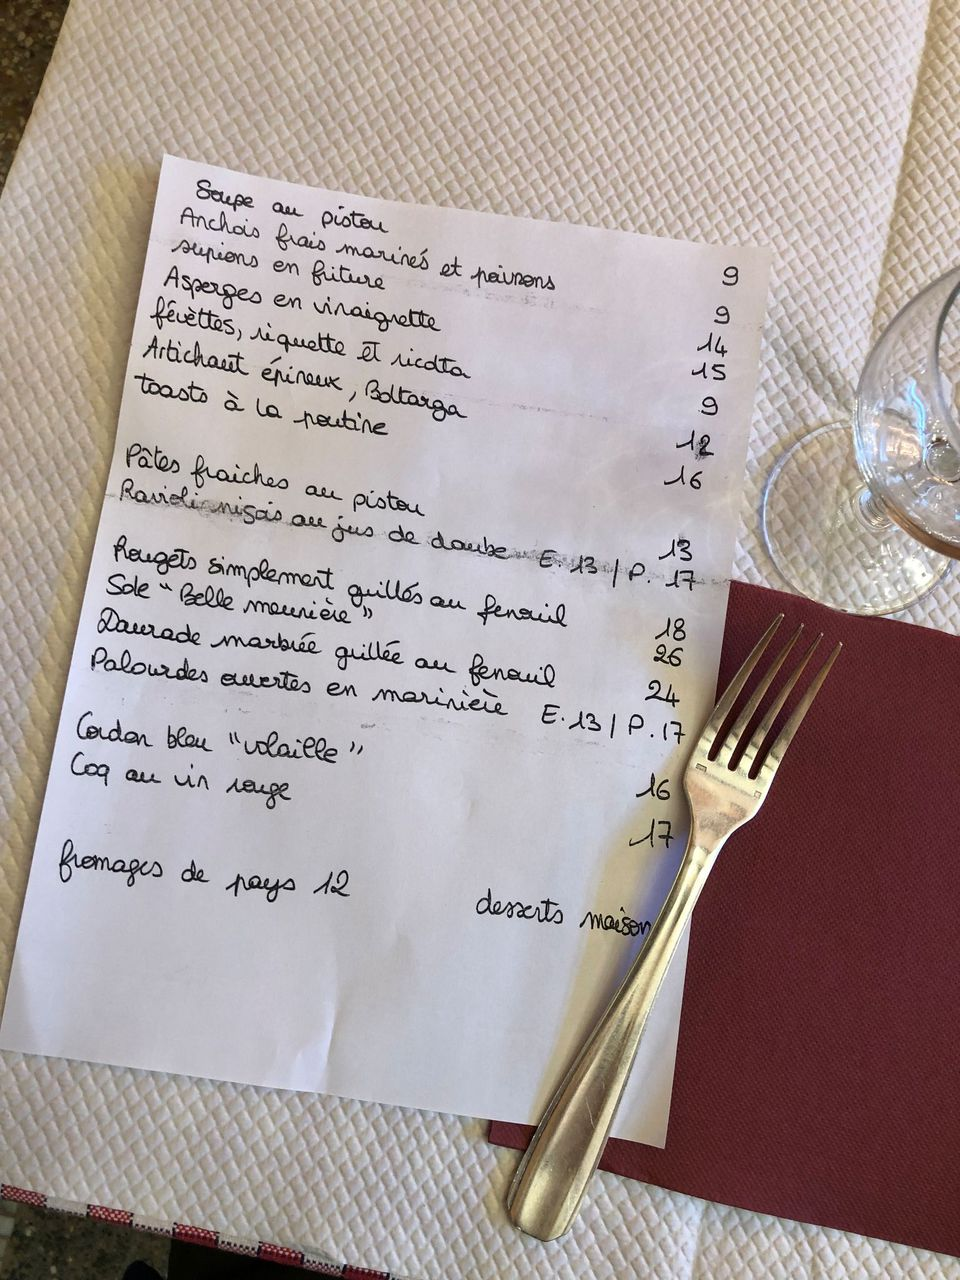 chez-davia-menu-sur-table-1_6173436.jpg